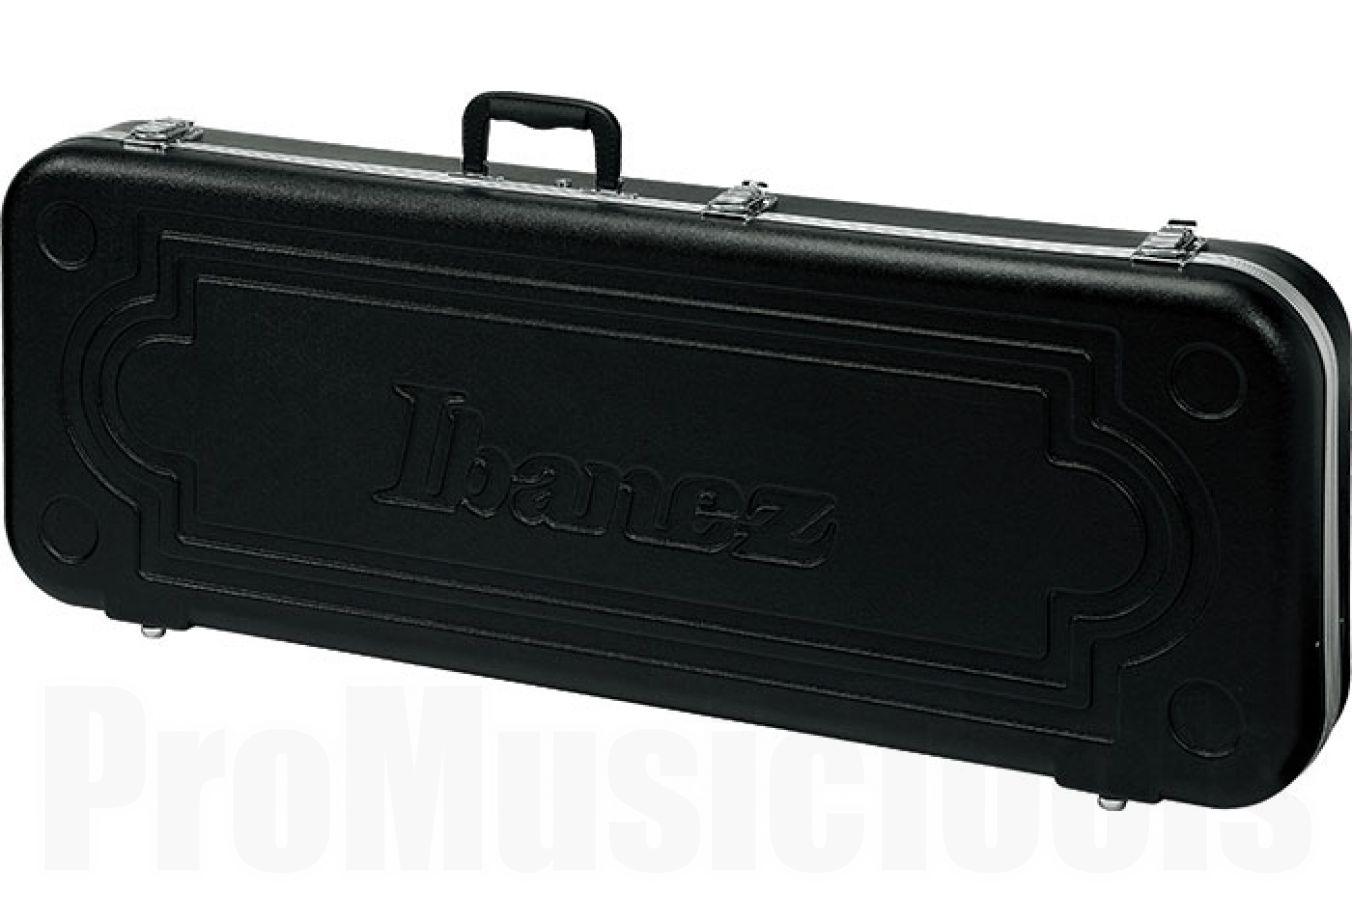 Ibanez M20RG Formfit Case for Ibanez RG